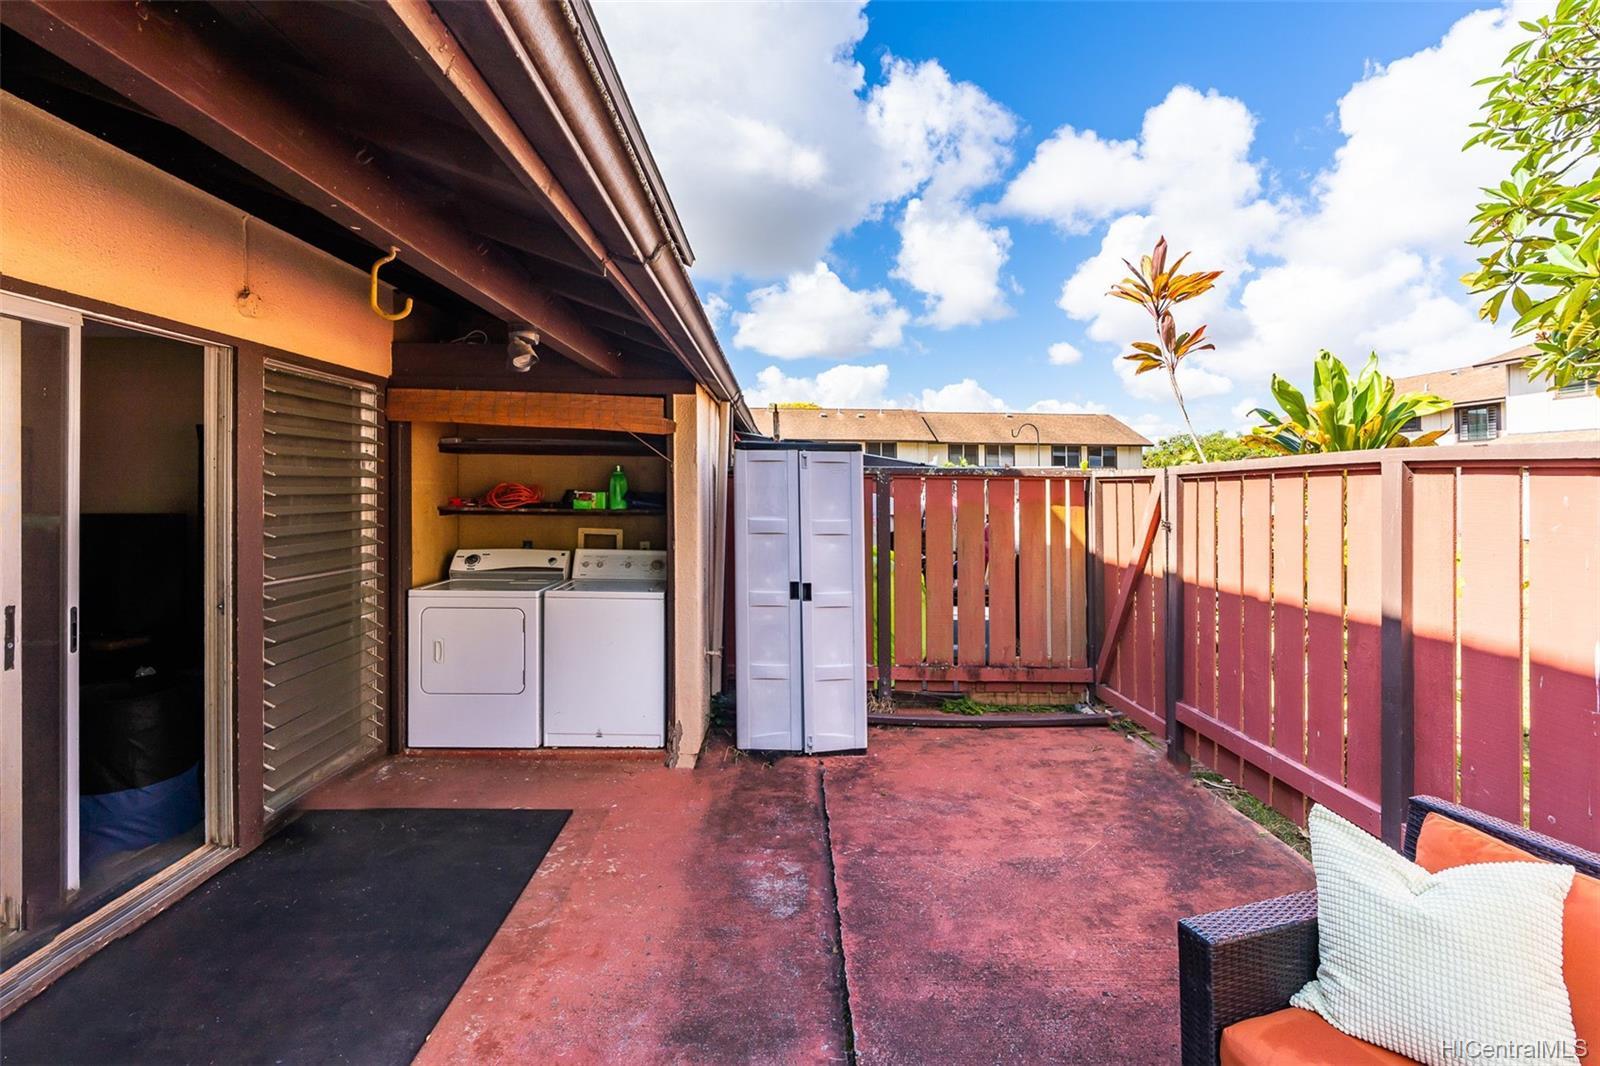 8086237300 townhouse # 470, Mililani, Hawaii - photo 22 of 25